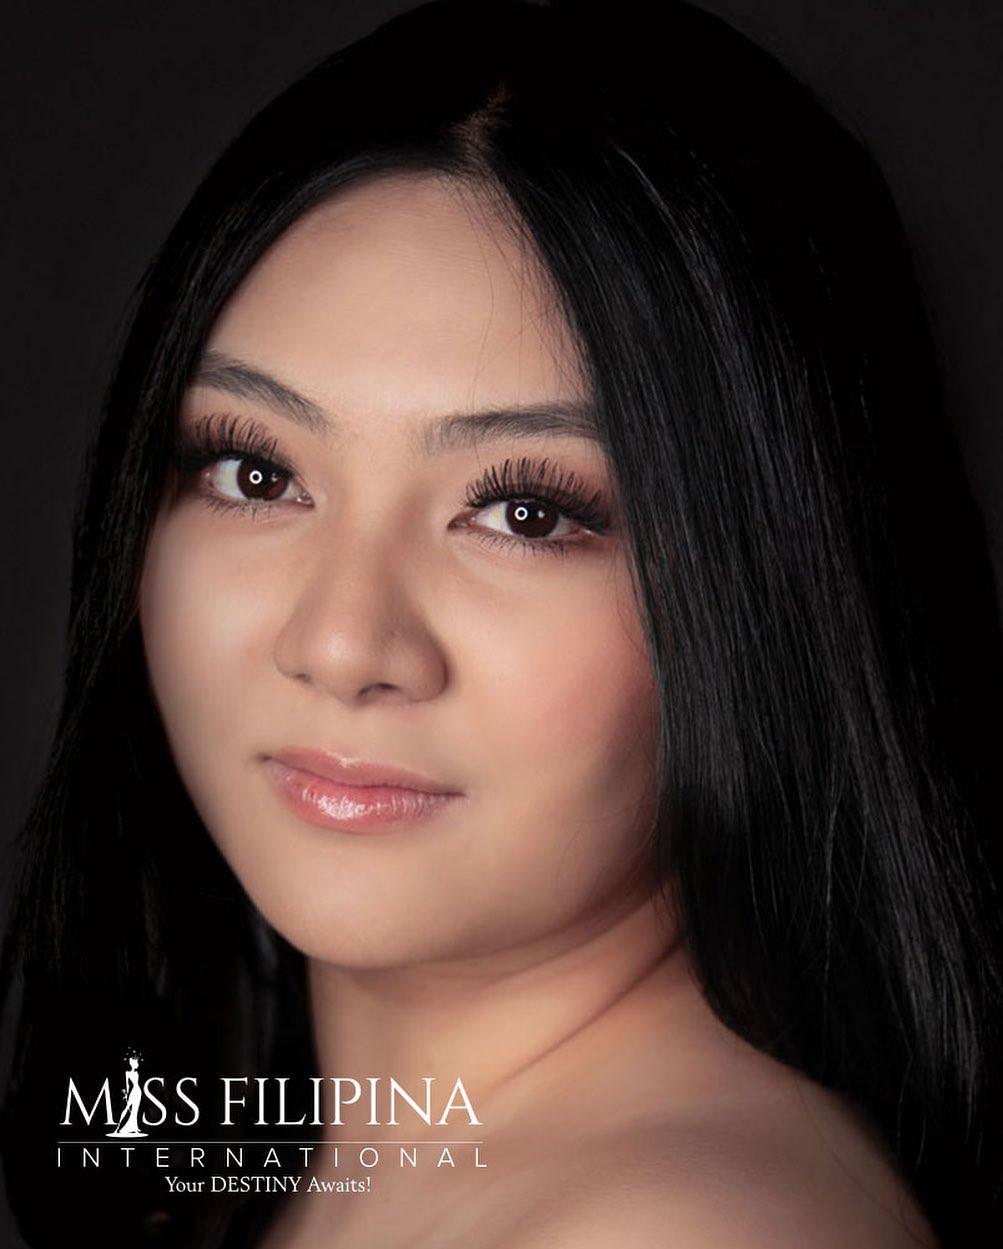 candidatas a miss filipina international 2021. final: 31 july. A52JX1